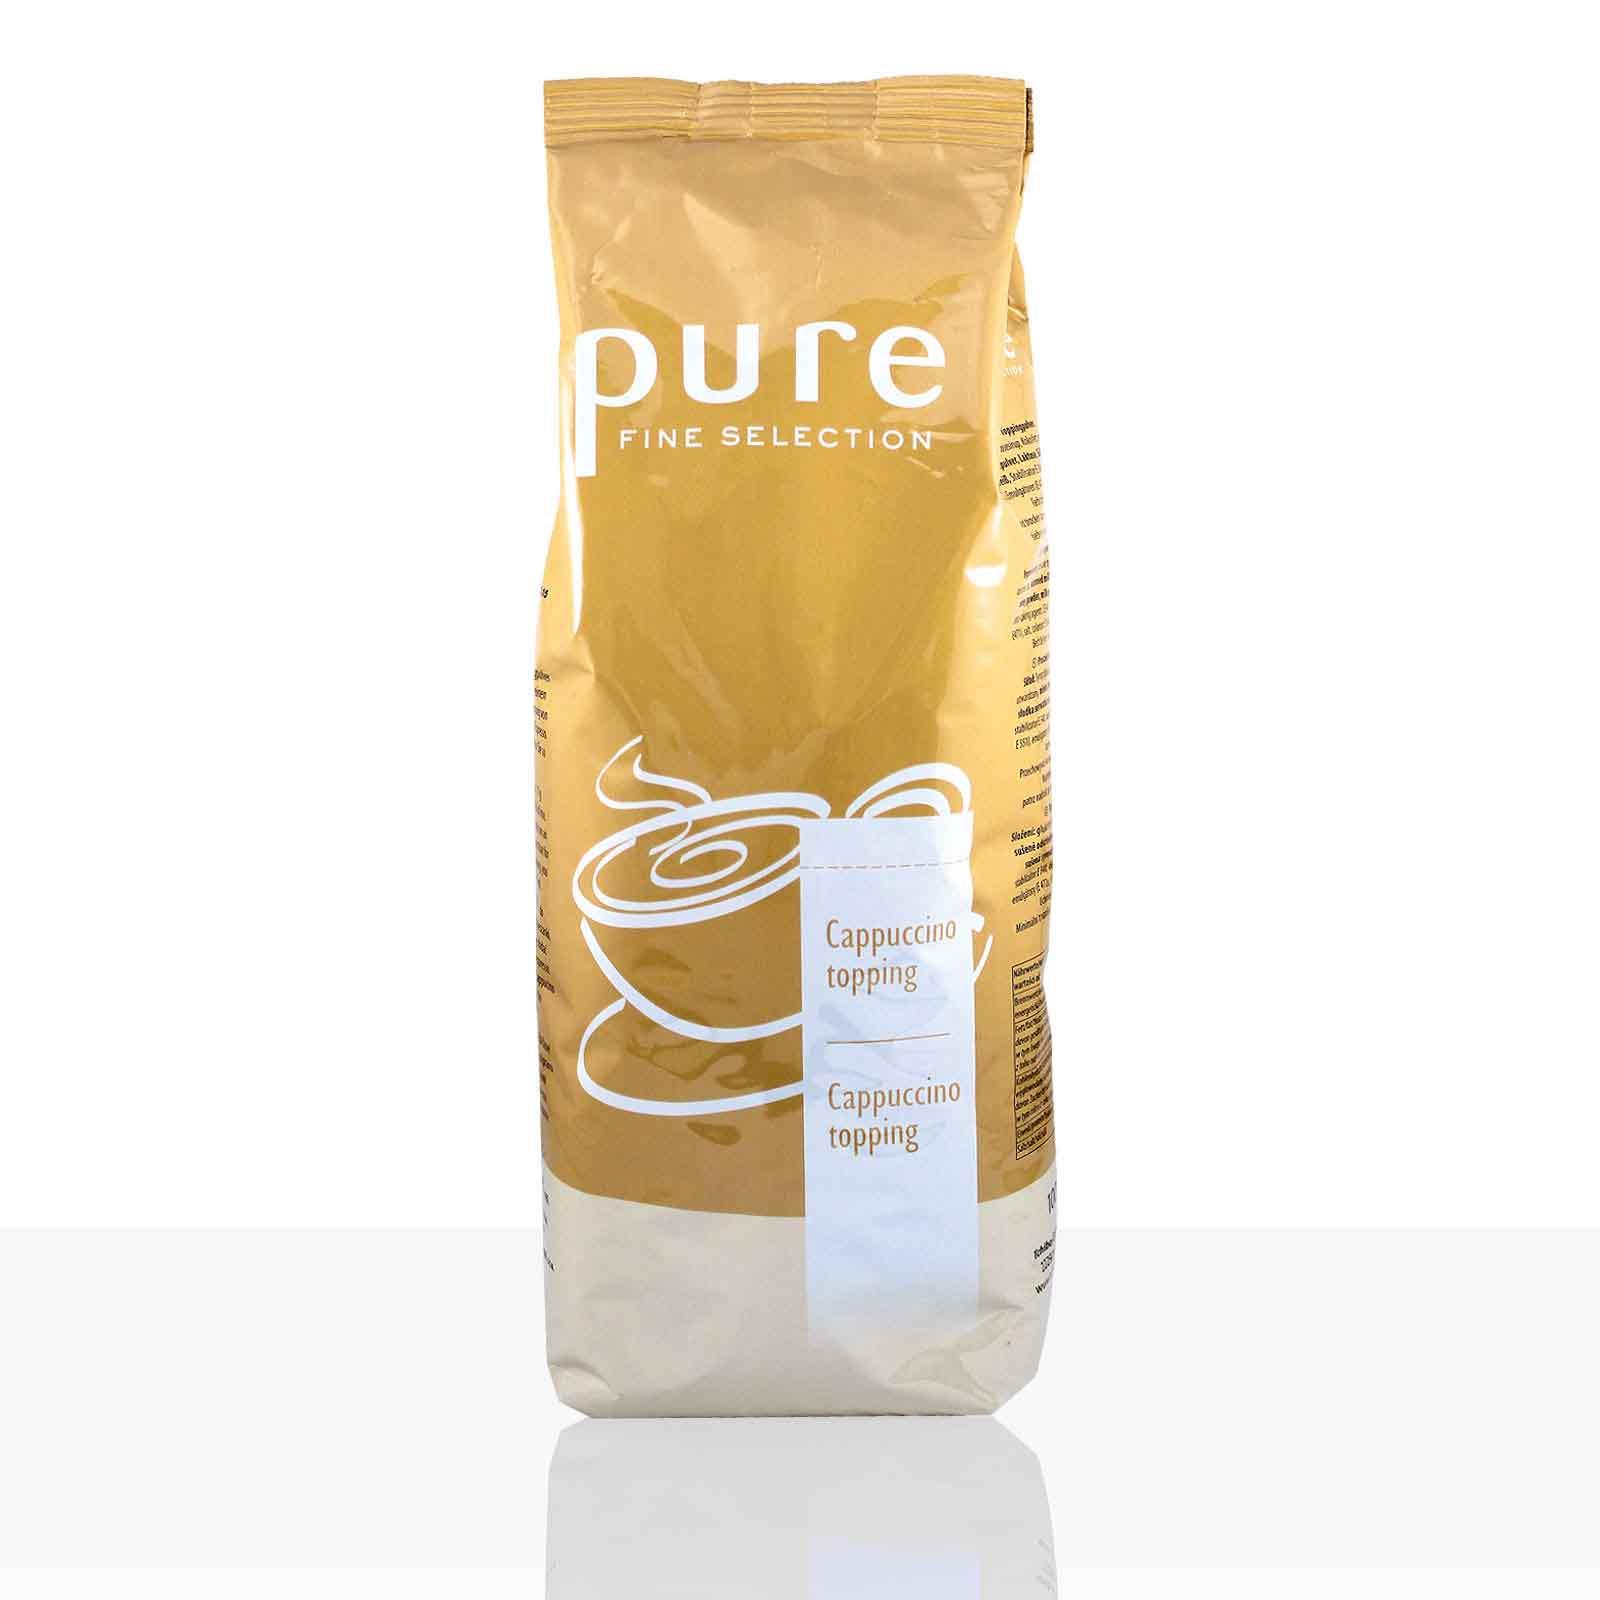 Tchibo Pure Fine Selection Cappuccino Topping Crema - 1kg Milchpulver